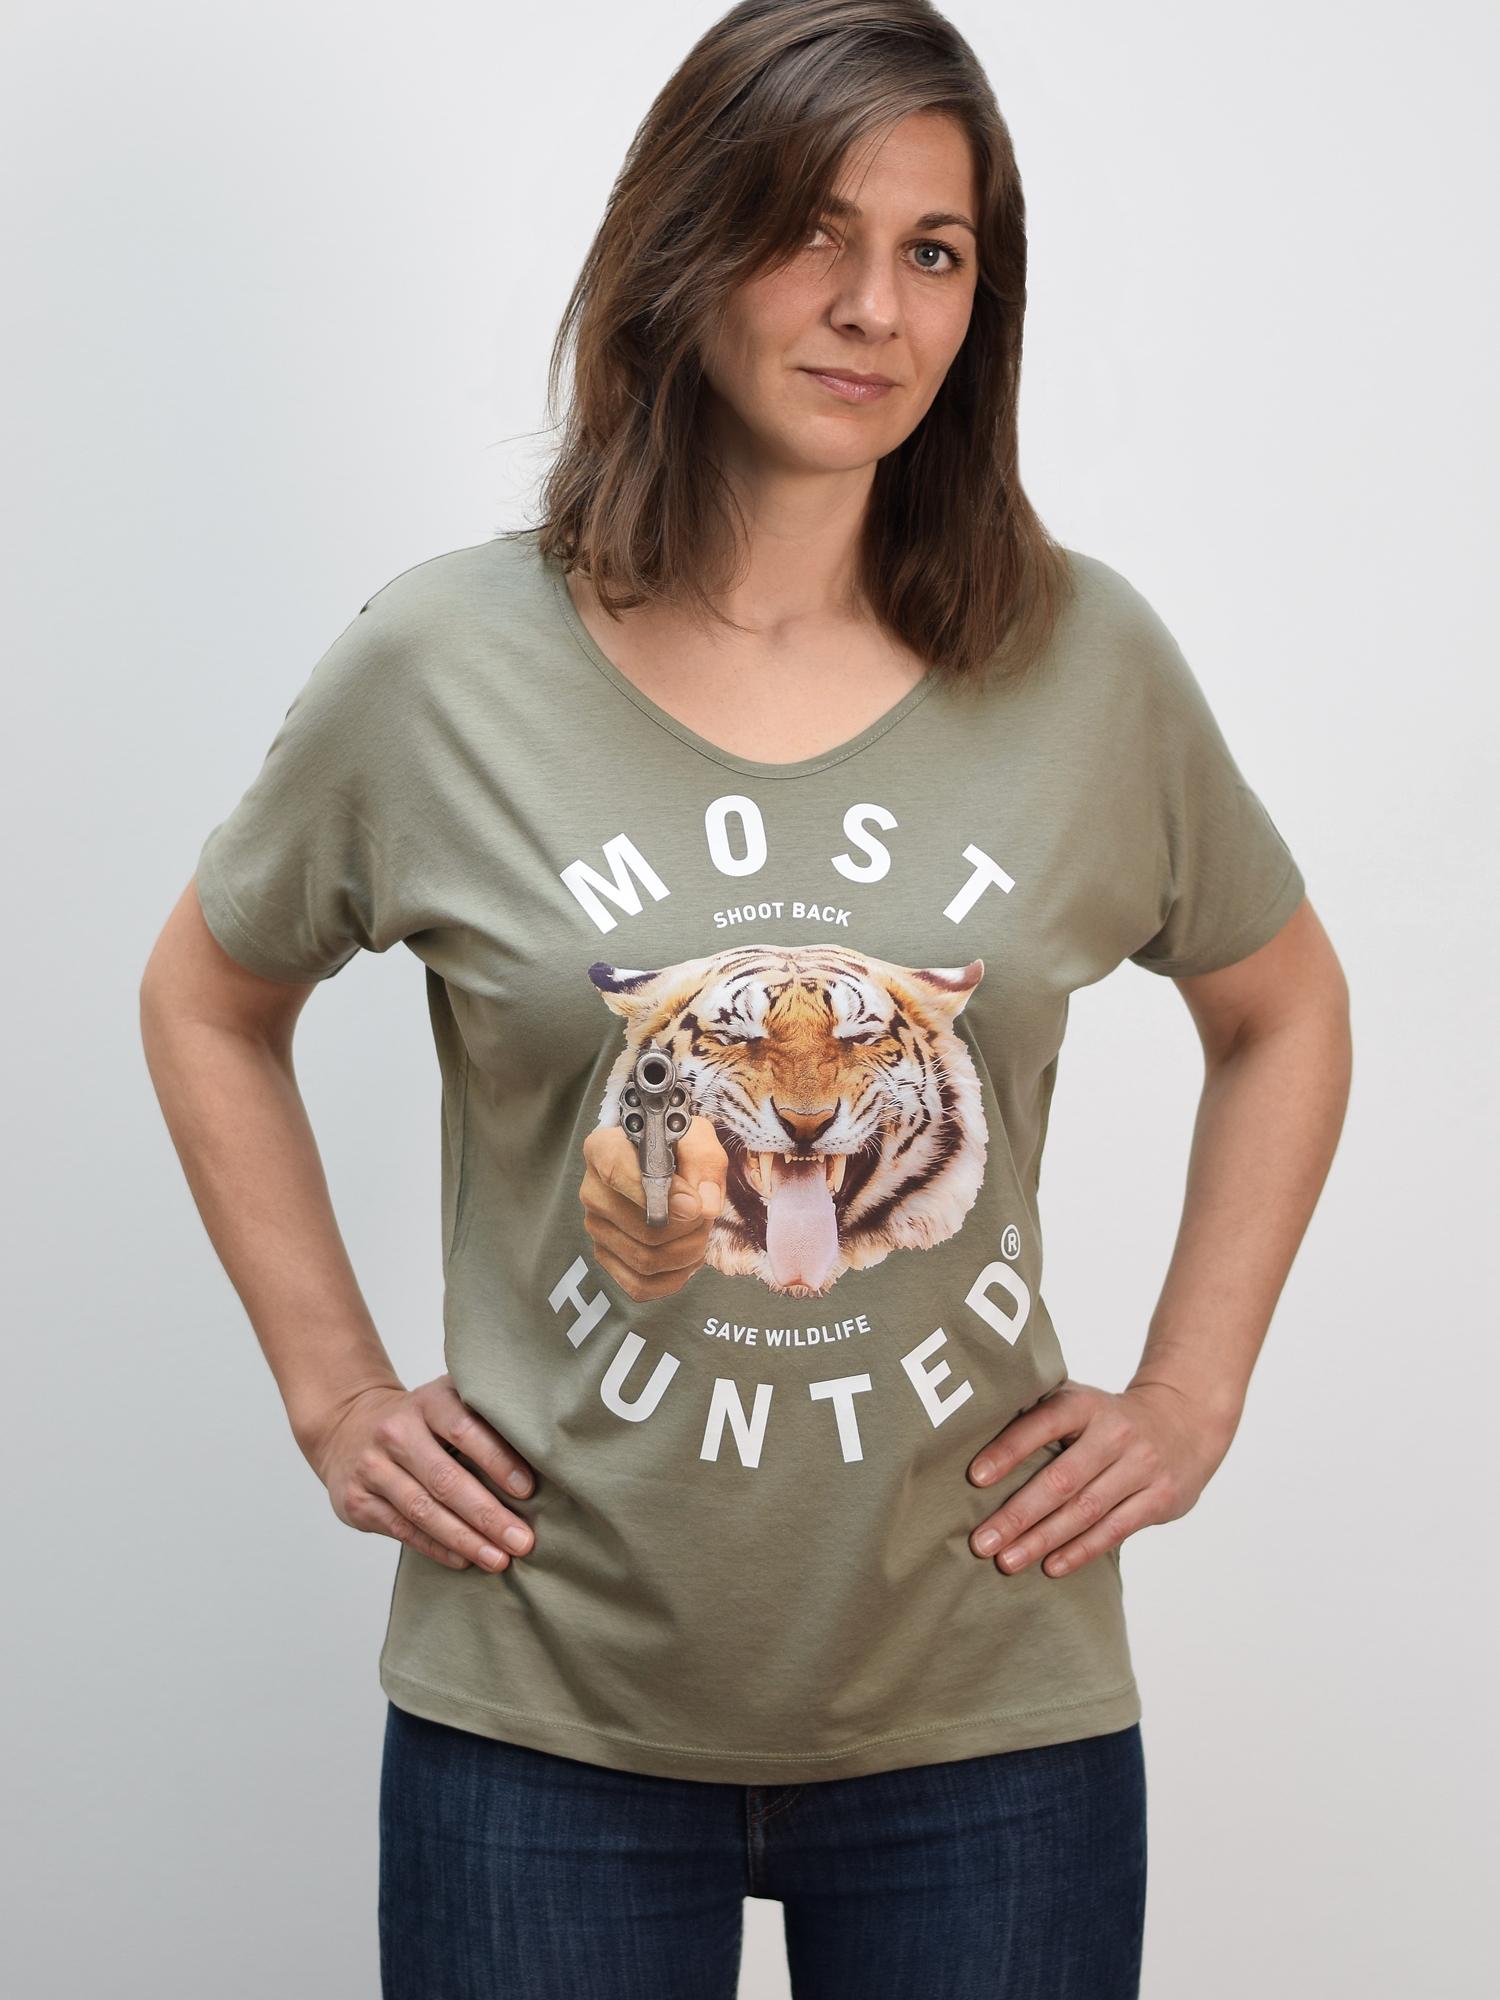 Real Tiger T Shirt Army Green Most Hunted